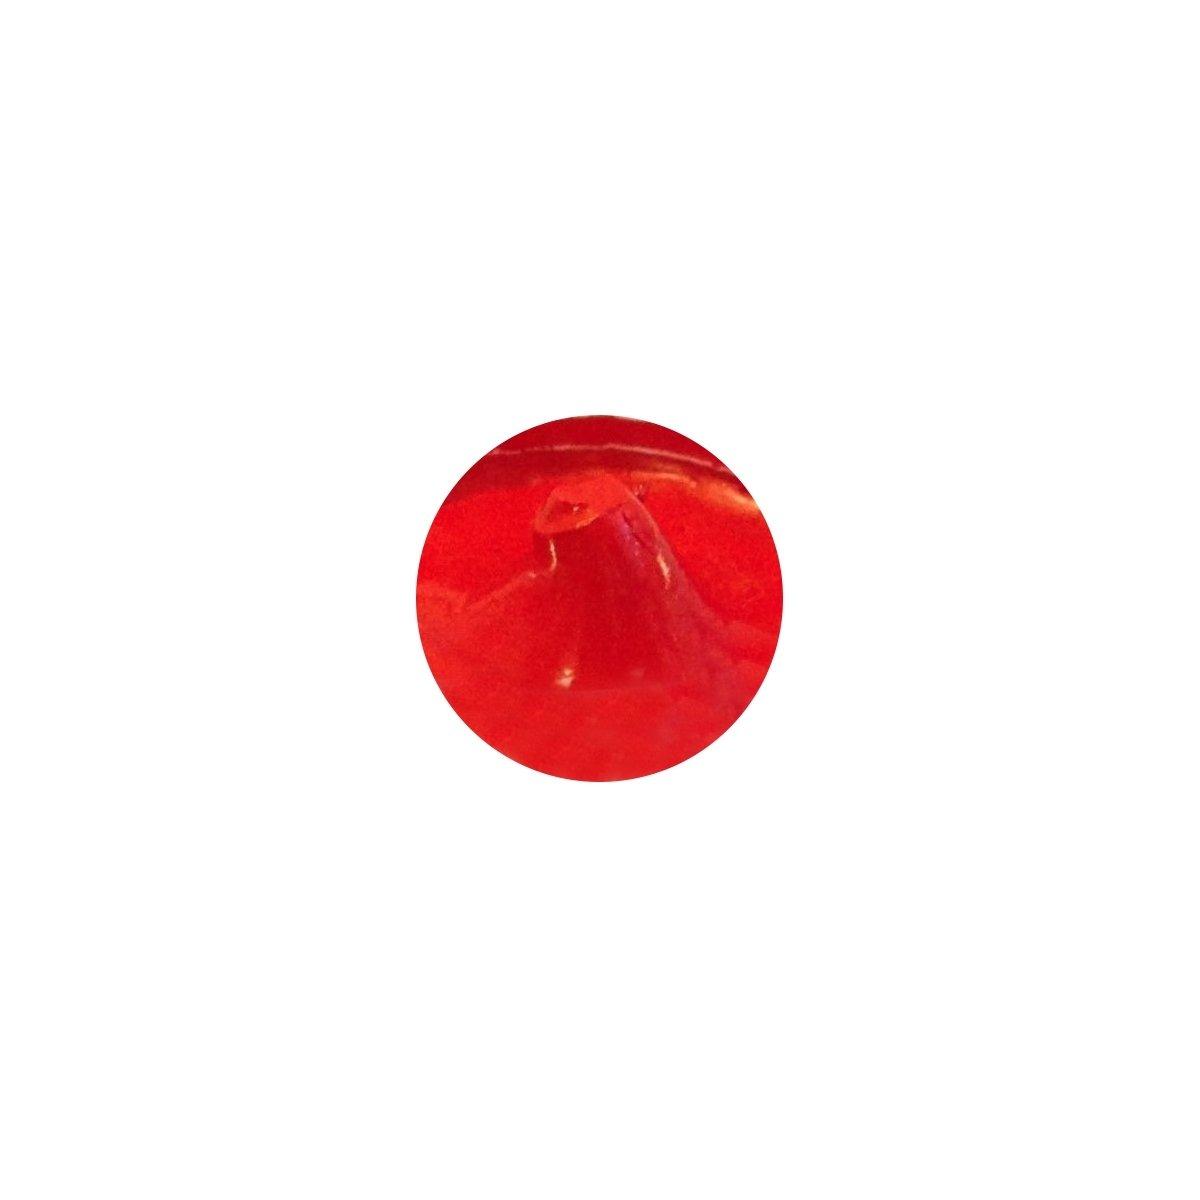 Tinta Genesis Pyrrole Red 03 - 4 gramas ou 8 gramas